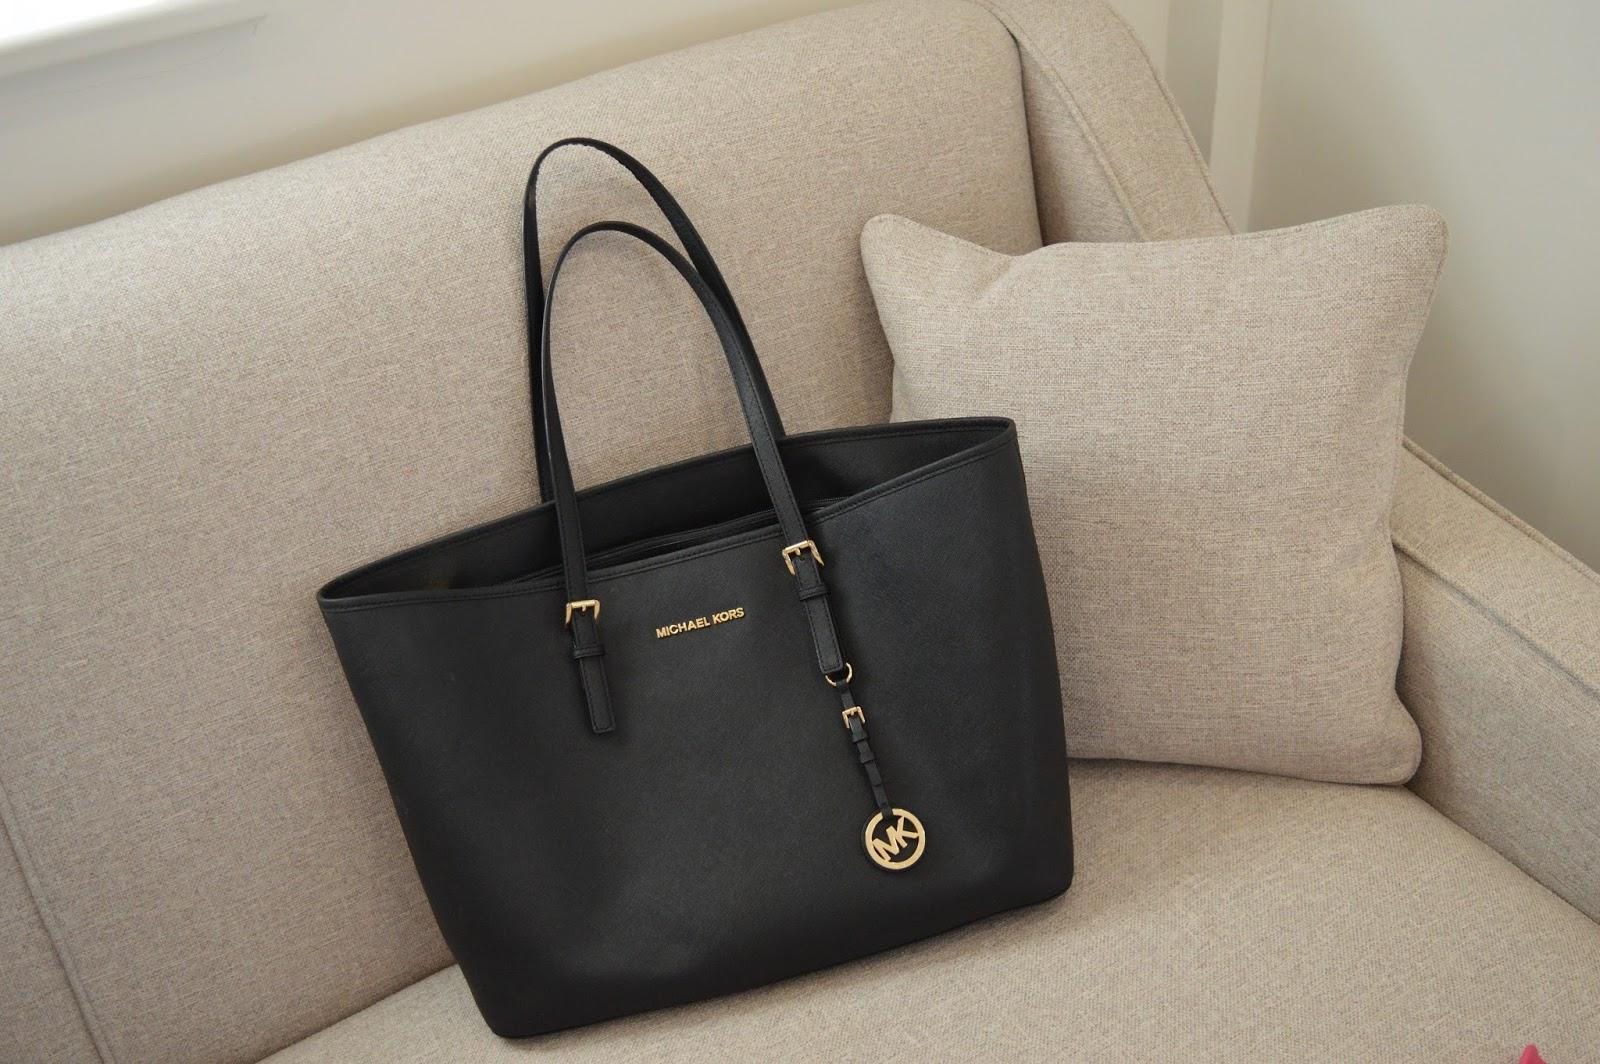 Used Michael Kors Handbags